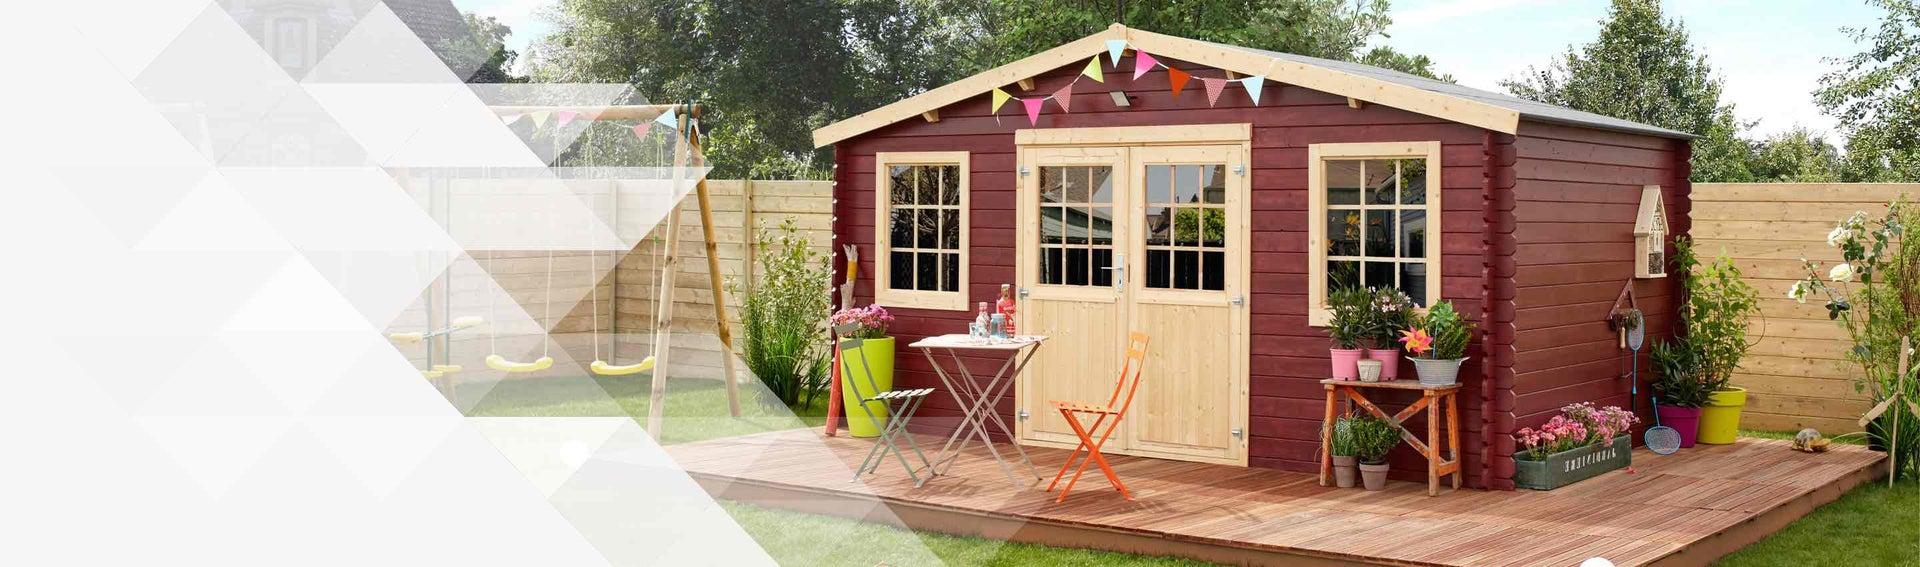 Grande Cabane De Jardin Pas Cher abri de jardin, cabane, chalet, kiosque, garage | leroy merlin